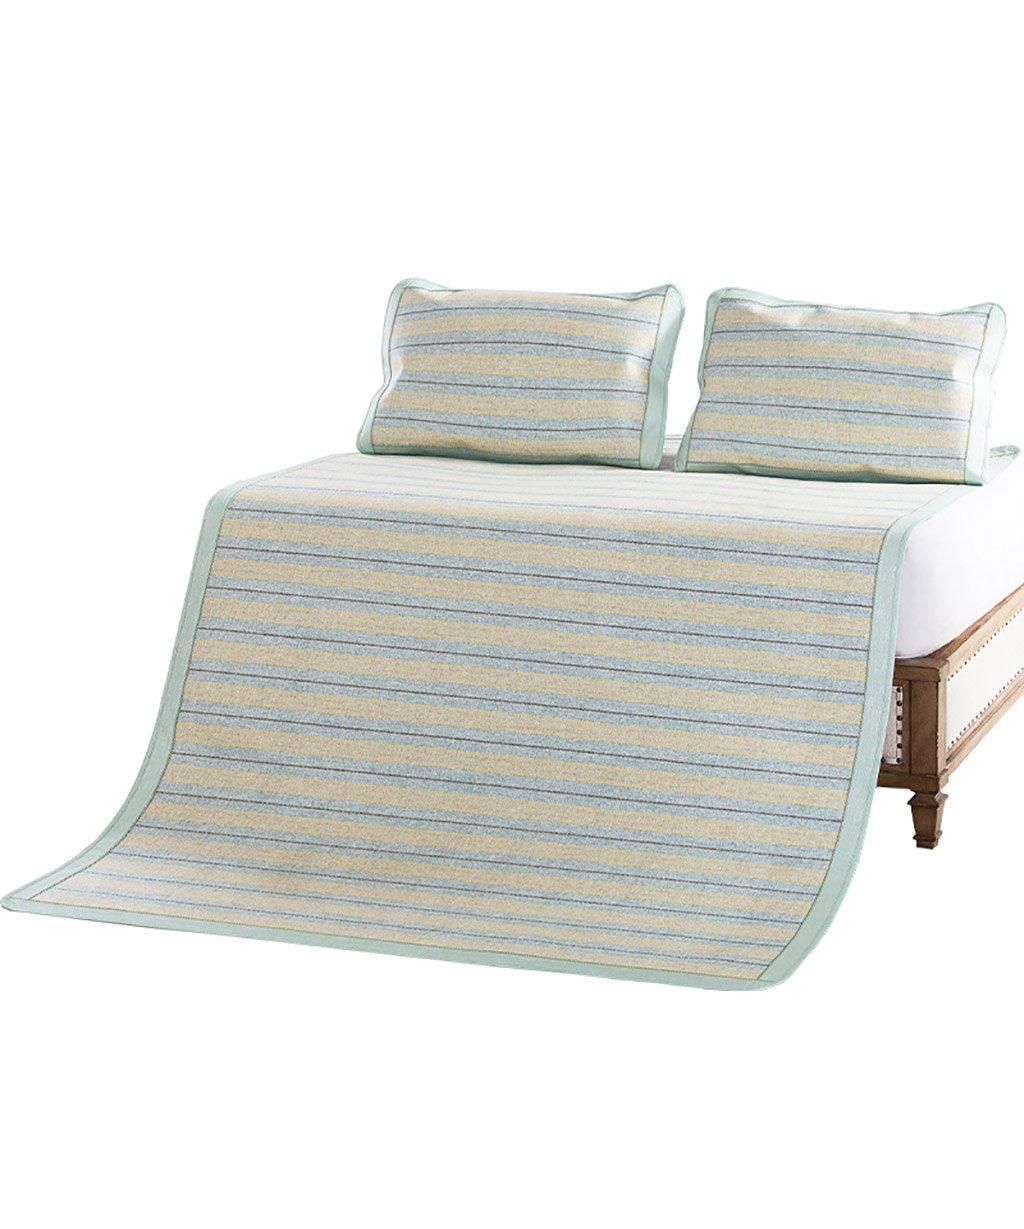 LIXIONG Plegable Verano durmiendo colchonetas Antideslizante ...